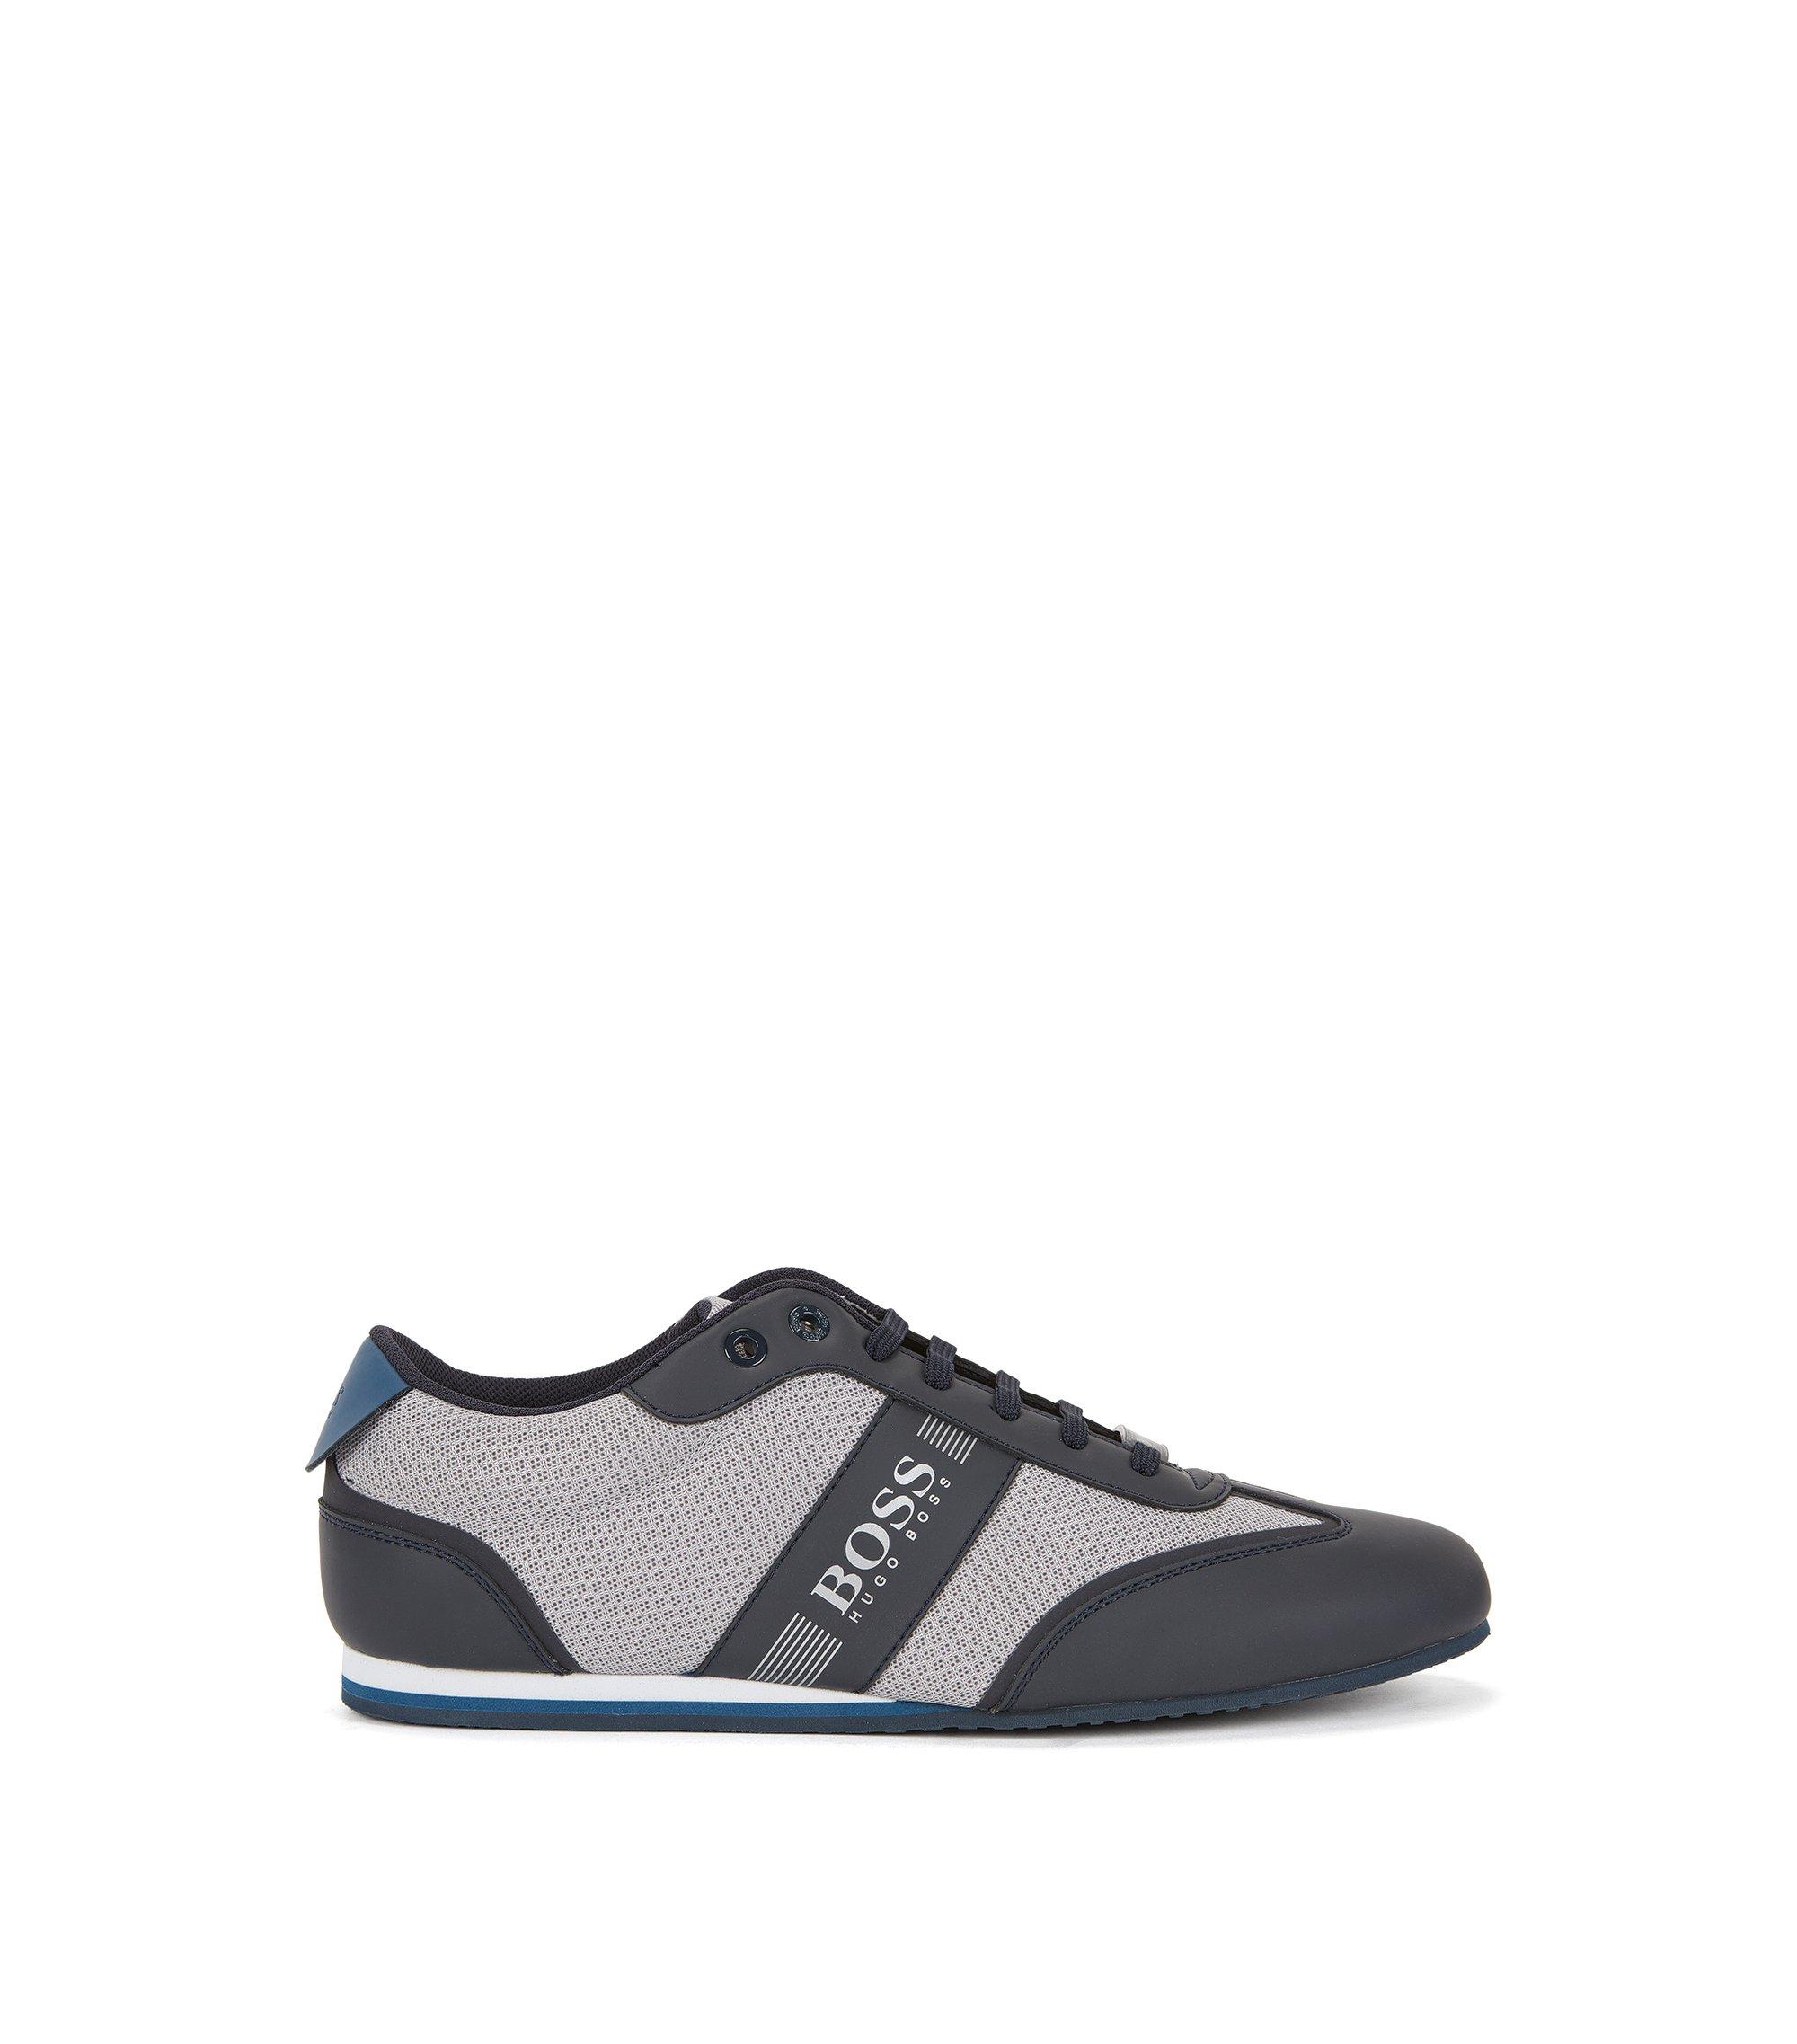 Mesh Sneaker | Lighter Lowp Mxme, Open Grey